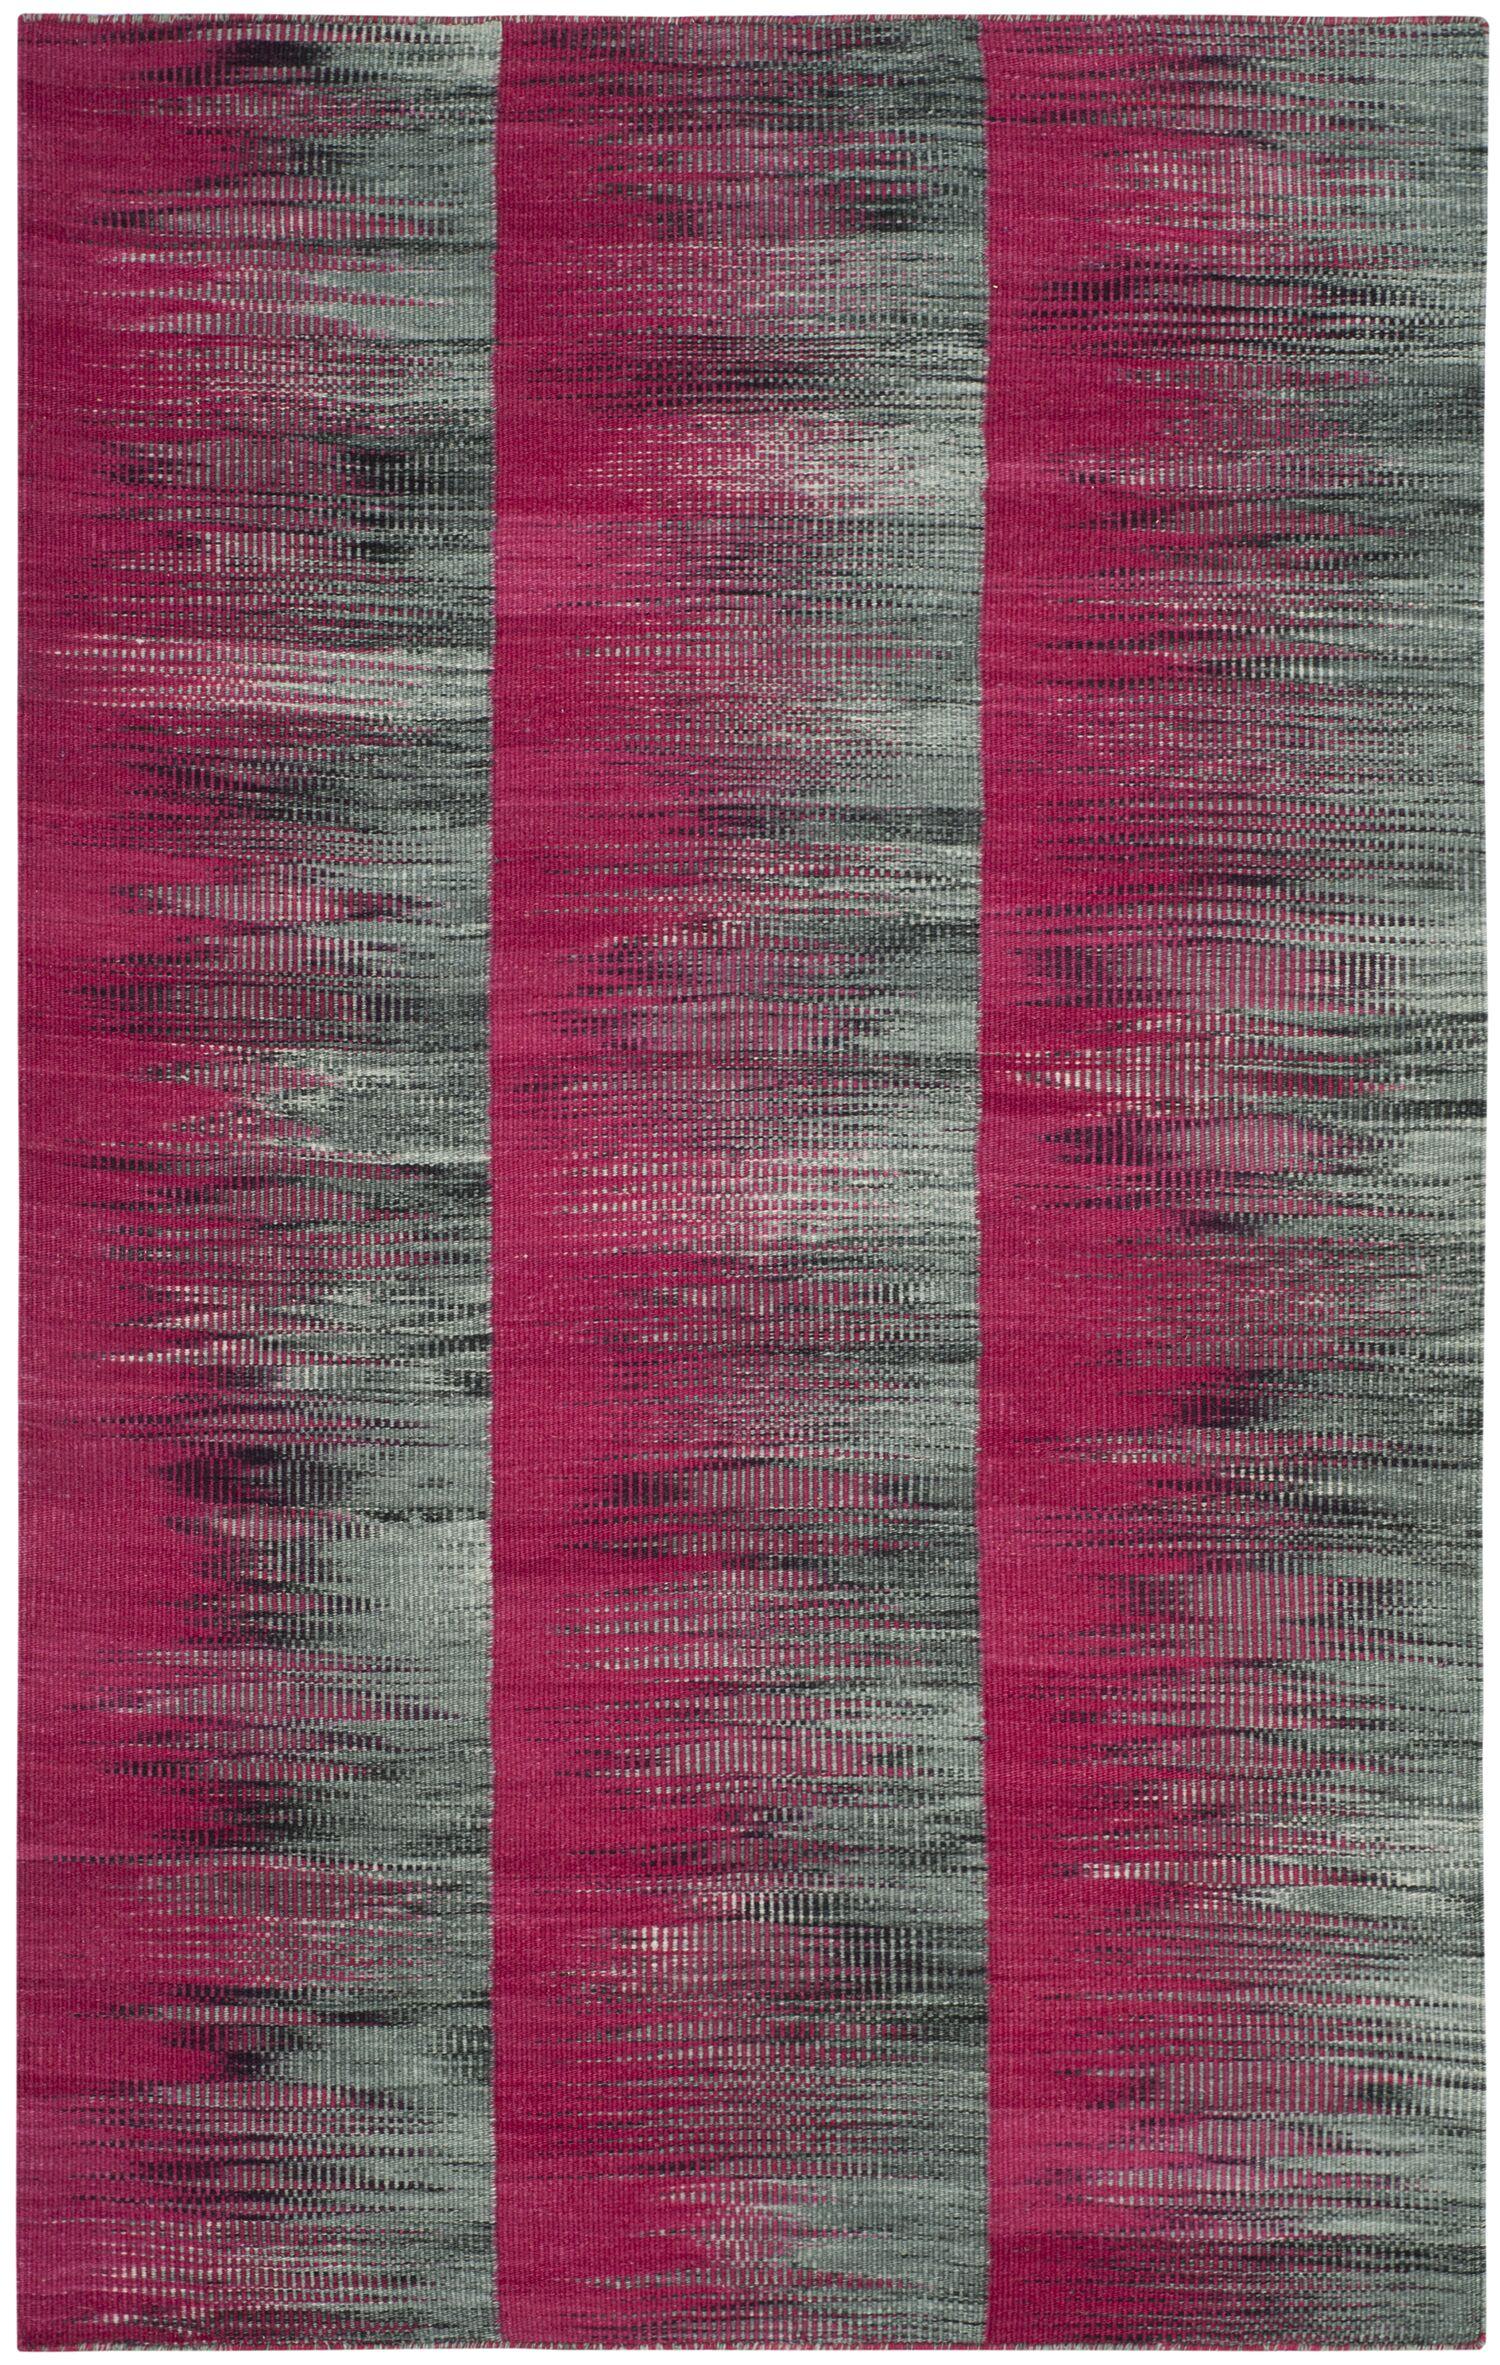 Amerina Hand-Woven Fuchsia/Charcoal Area Rug Rug Size: Rectangle 4' x 6'